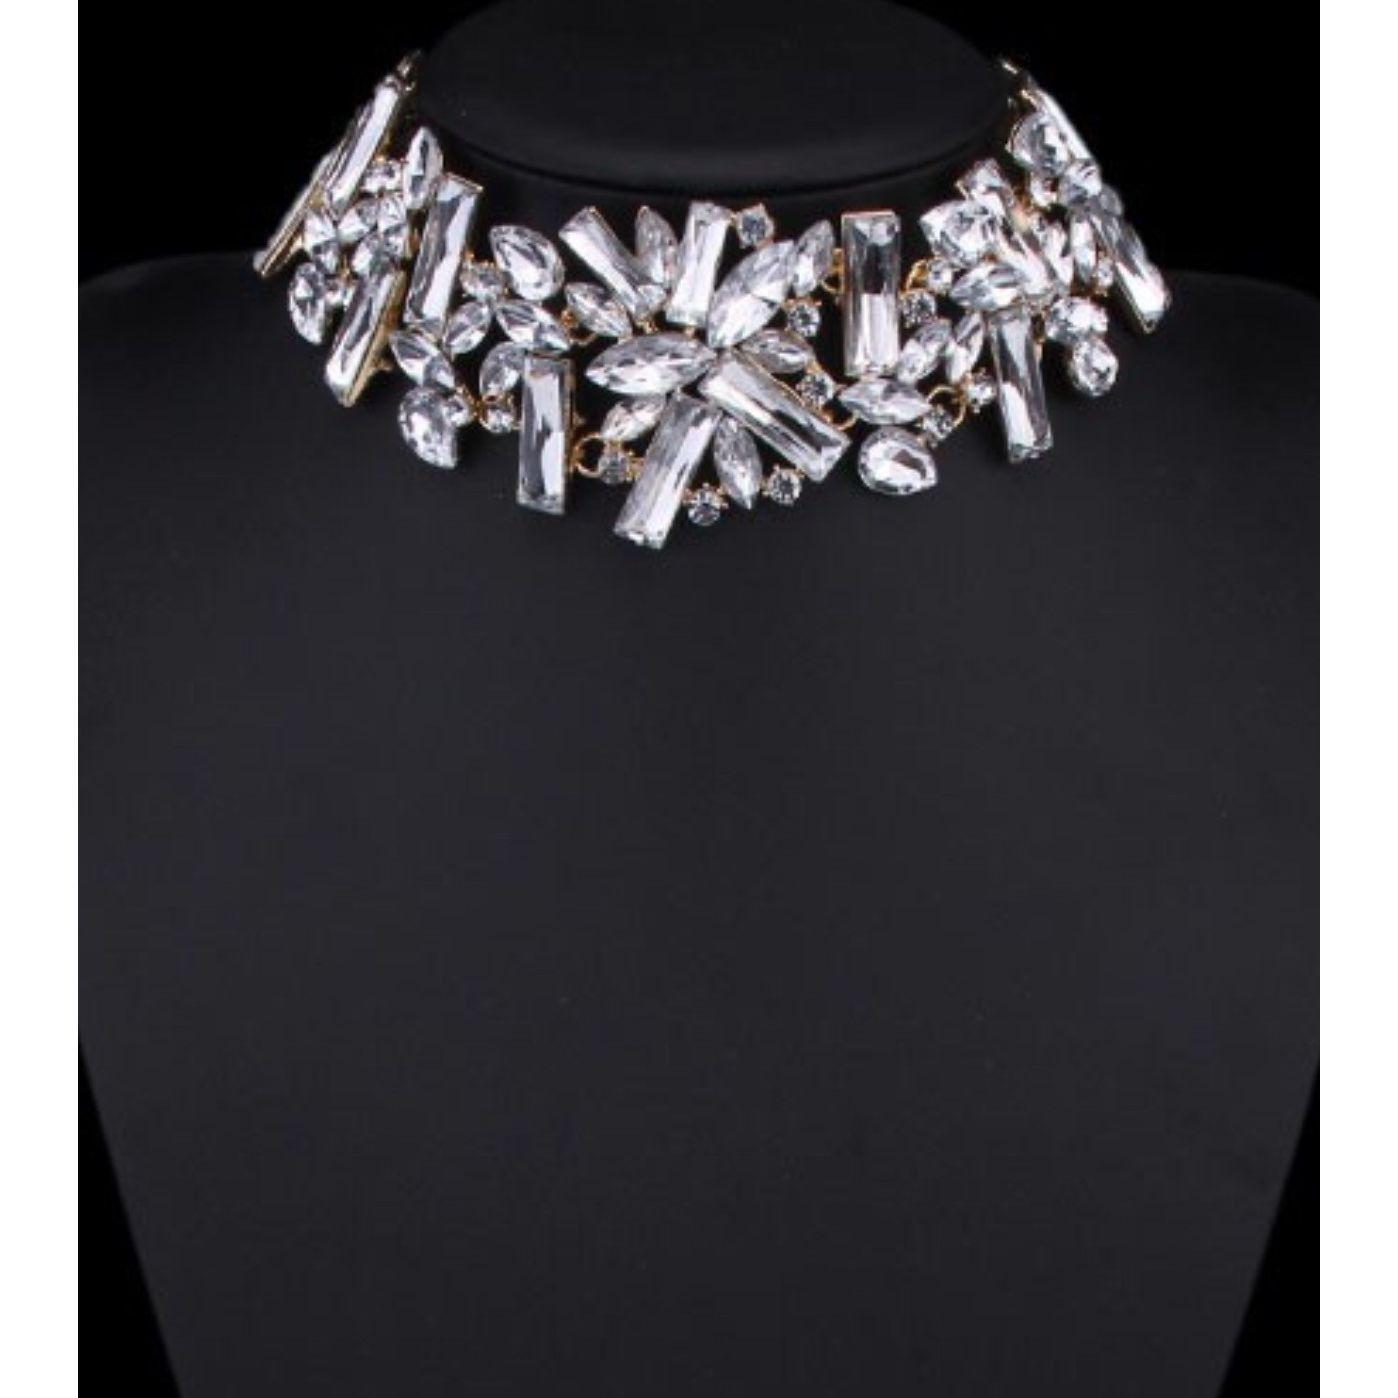 Jeweled Rhinestone Collar Necklace